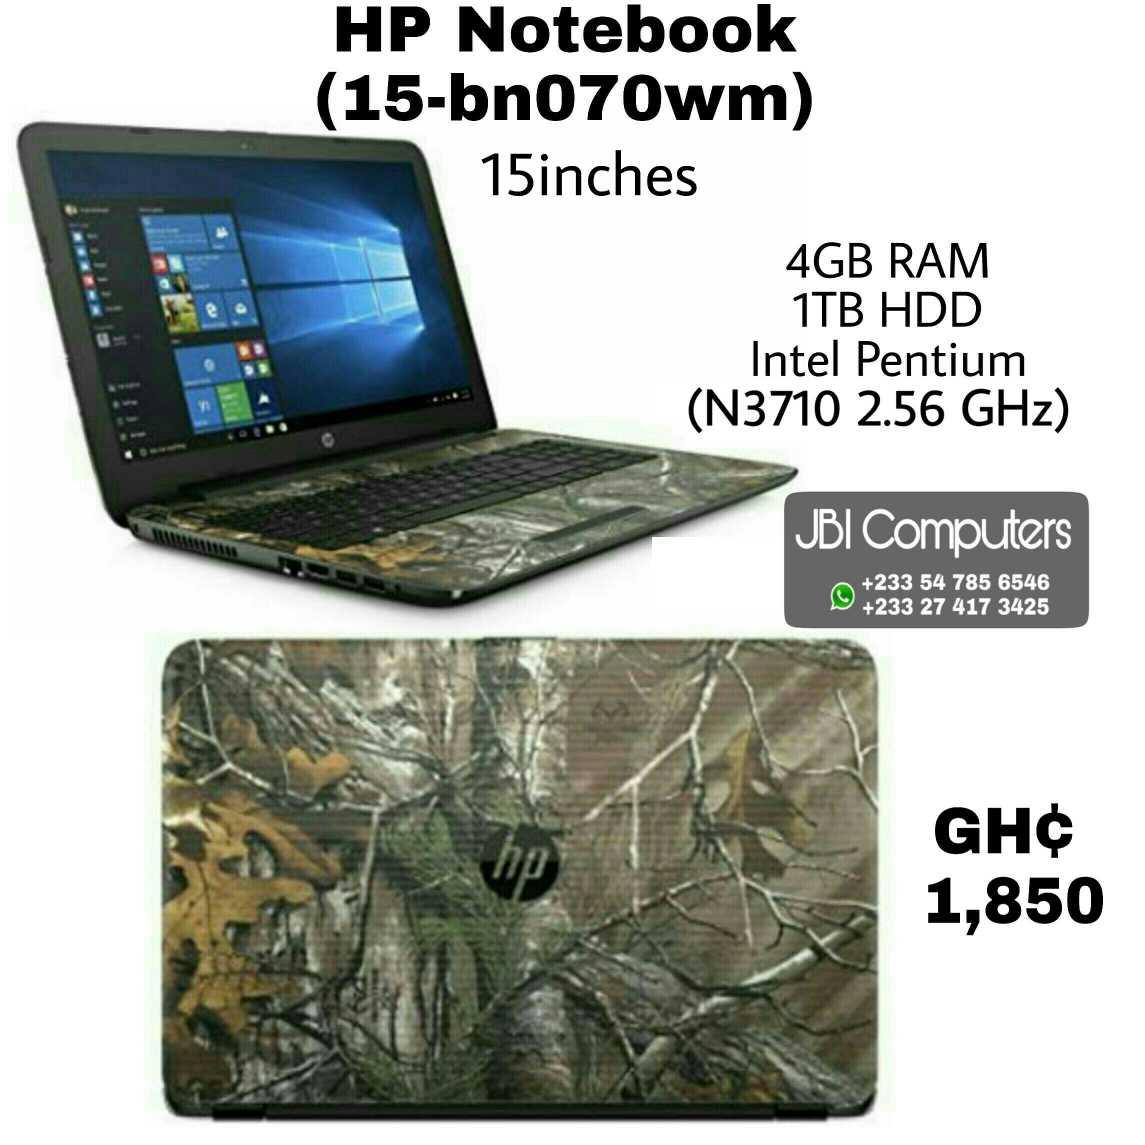 hp notebook realtree